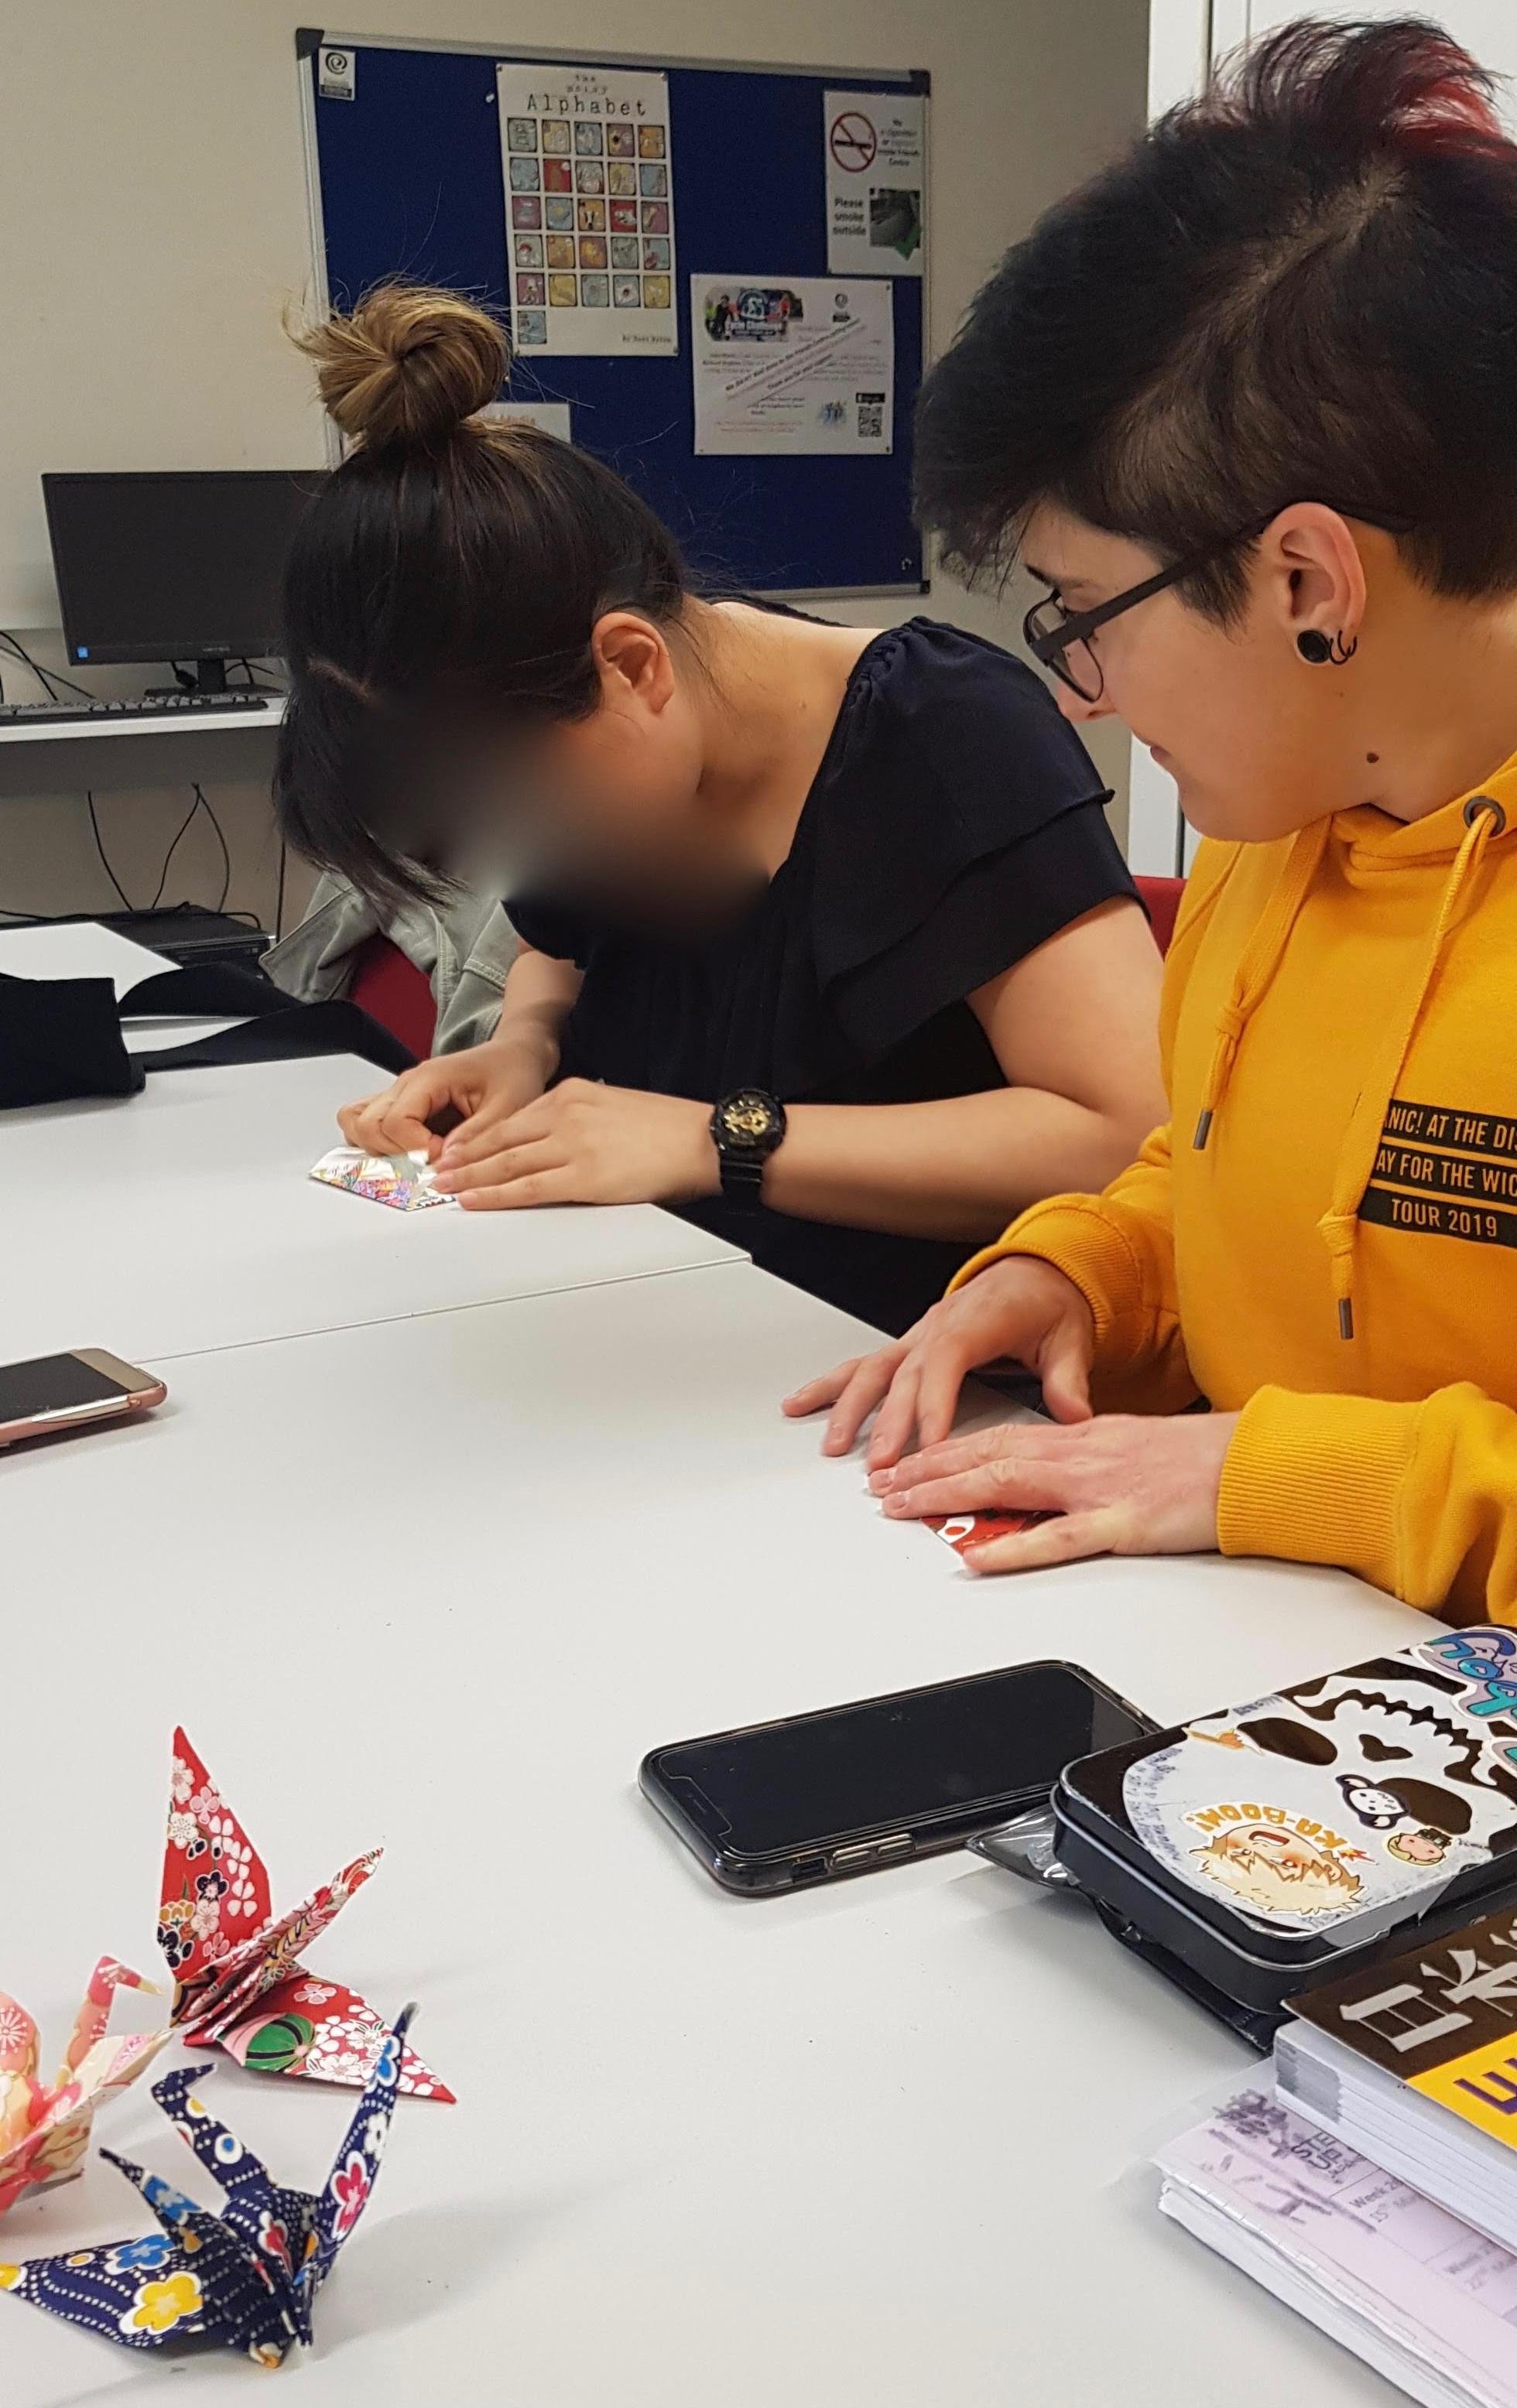 Origami+Workshop+Step+Up+Japanese+Class+Brighton+Fran+Wrigley+June+2019+20190606_191033+crop+%281%29.jpg